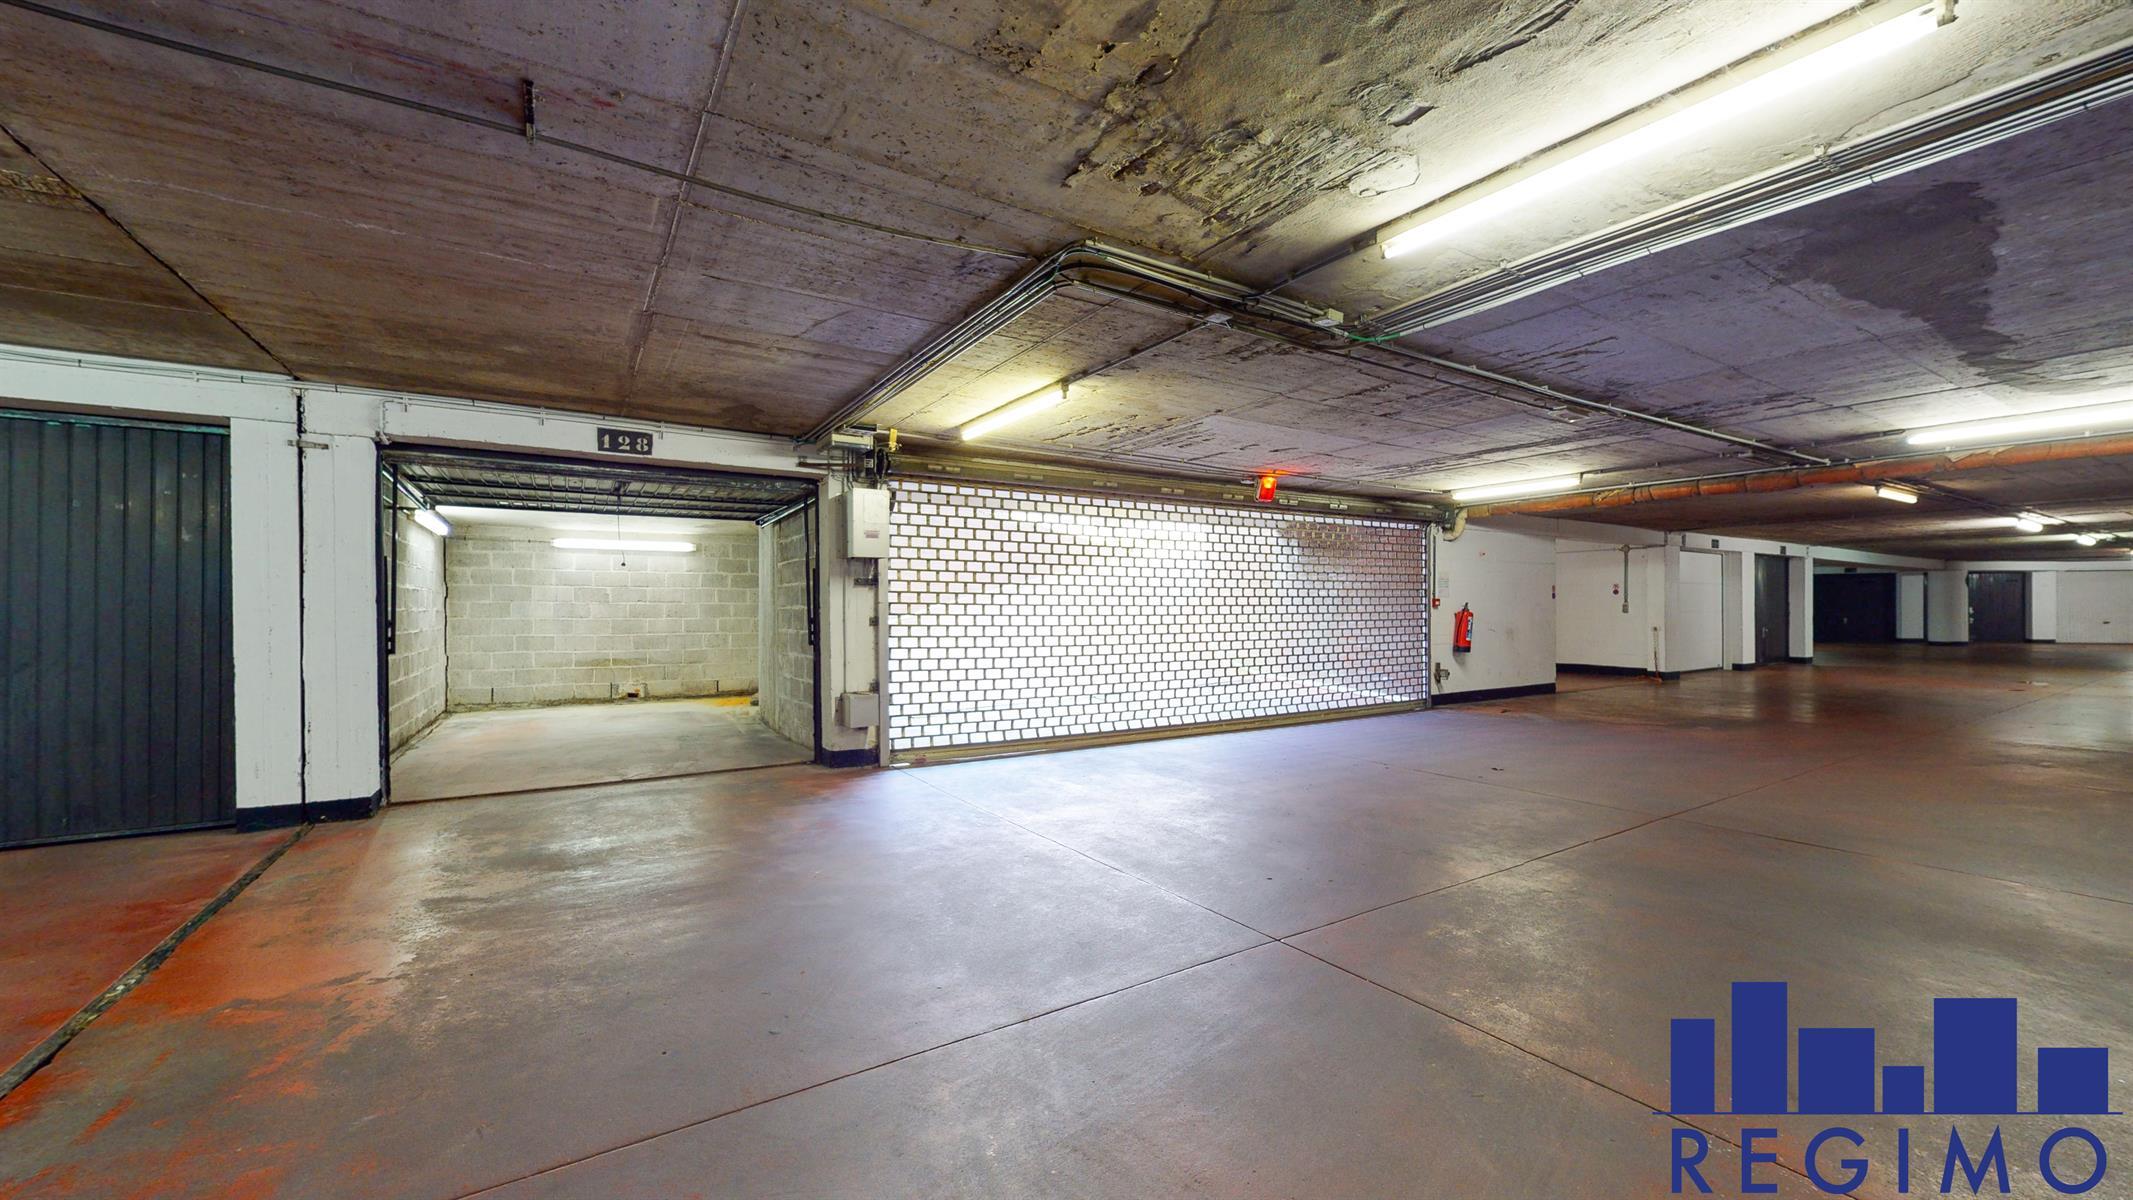 Flat - Molenbeek-Saint-Jean - #4235348-13